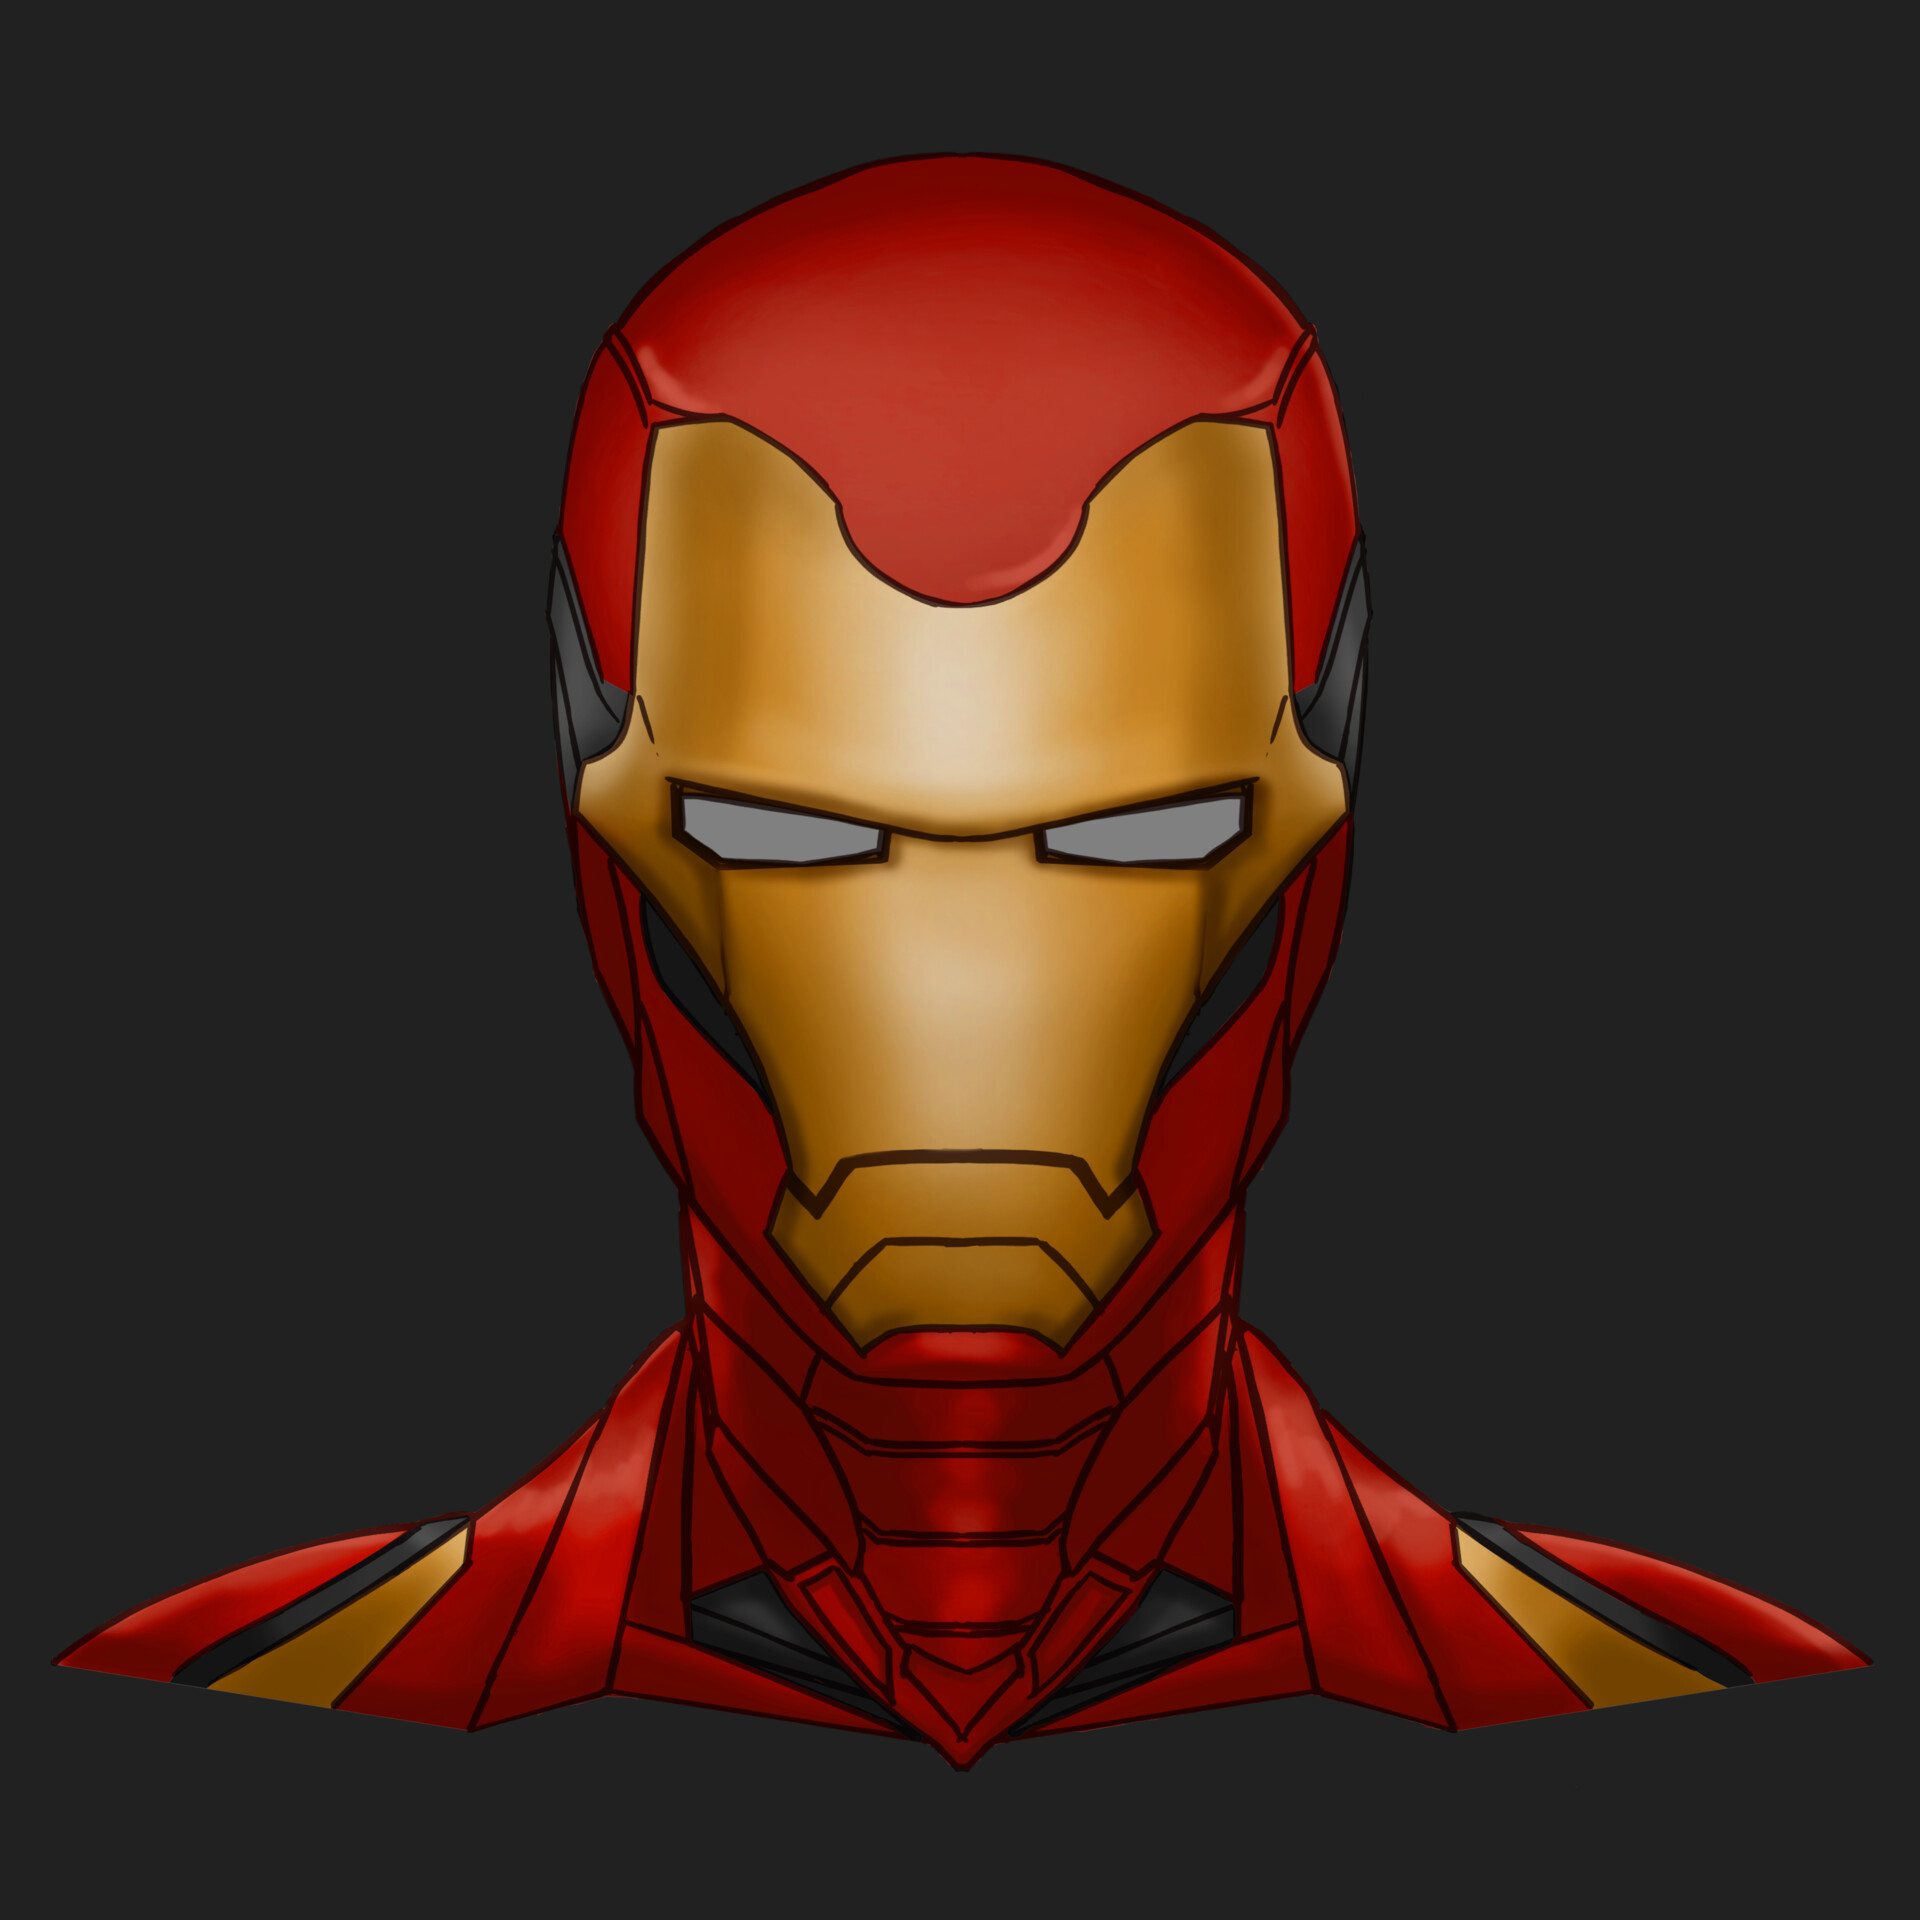 - ArtStation - Iron Man (Avengers: Endgame), Paolo Jandicala